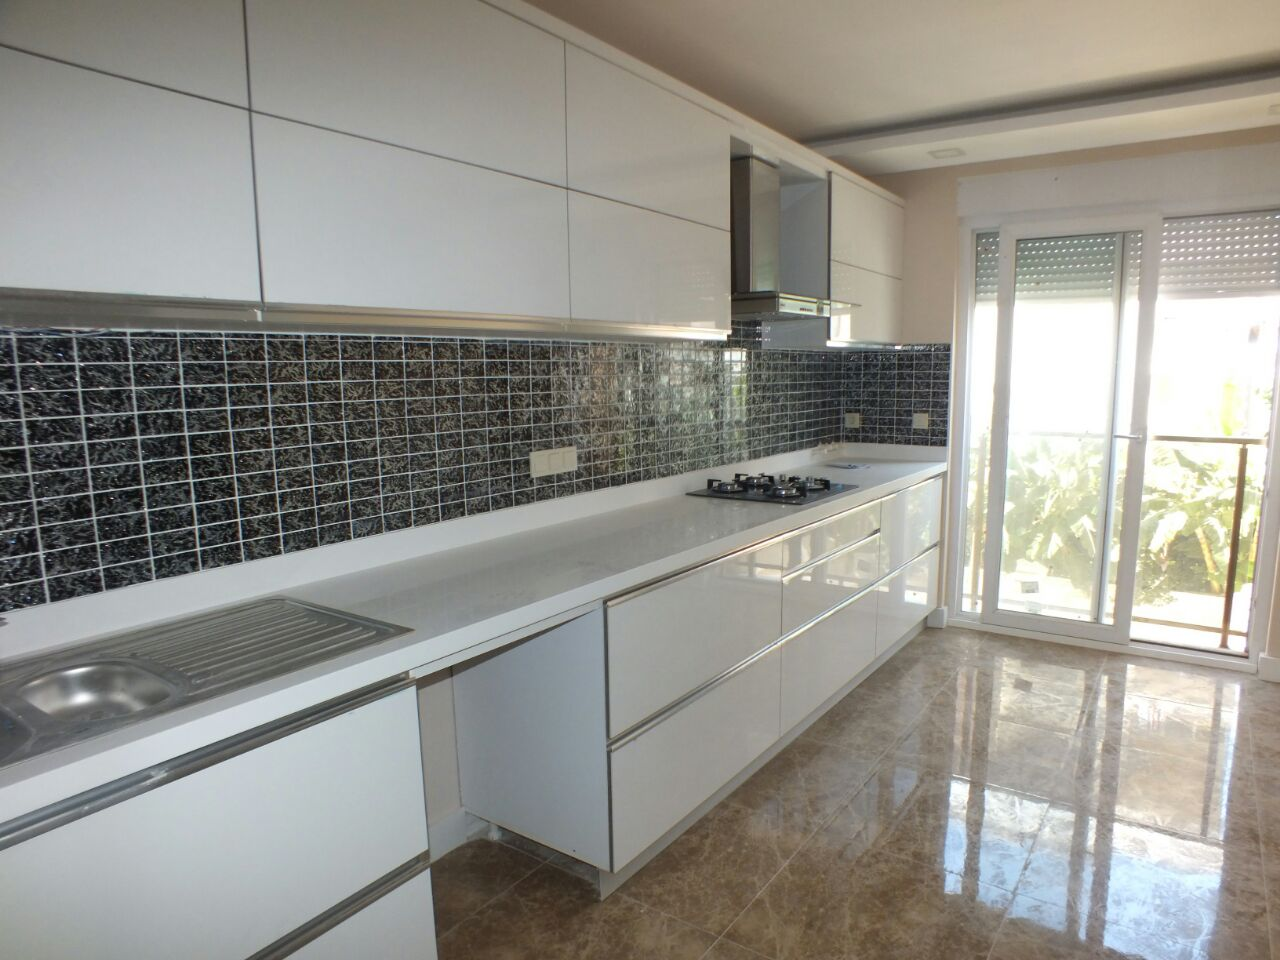 Продажа апартаментов в Анталии — Atlantis Residence (3+1)_I